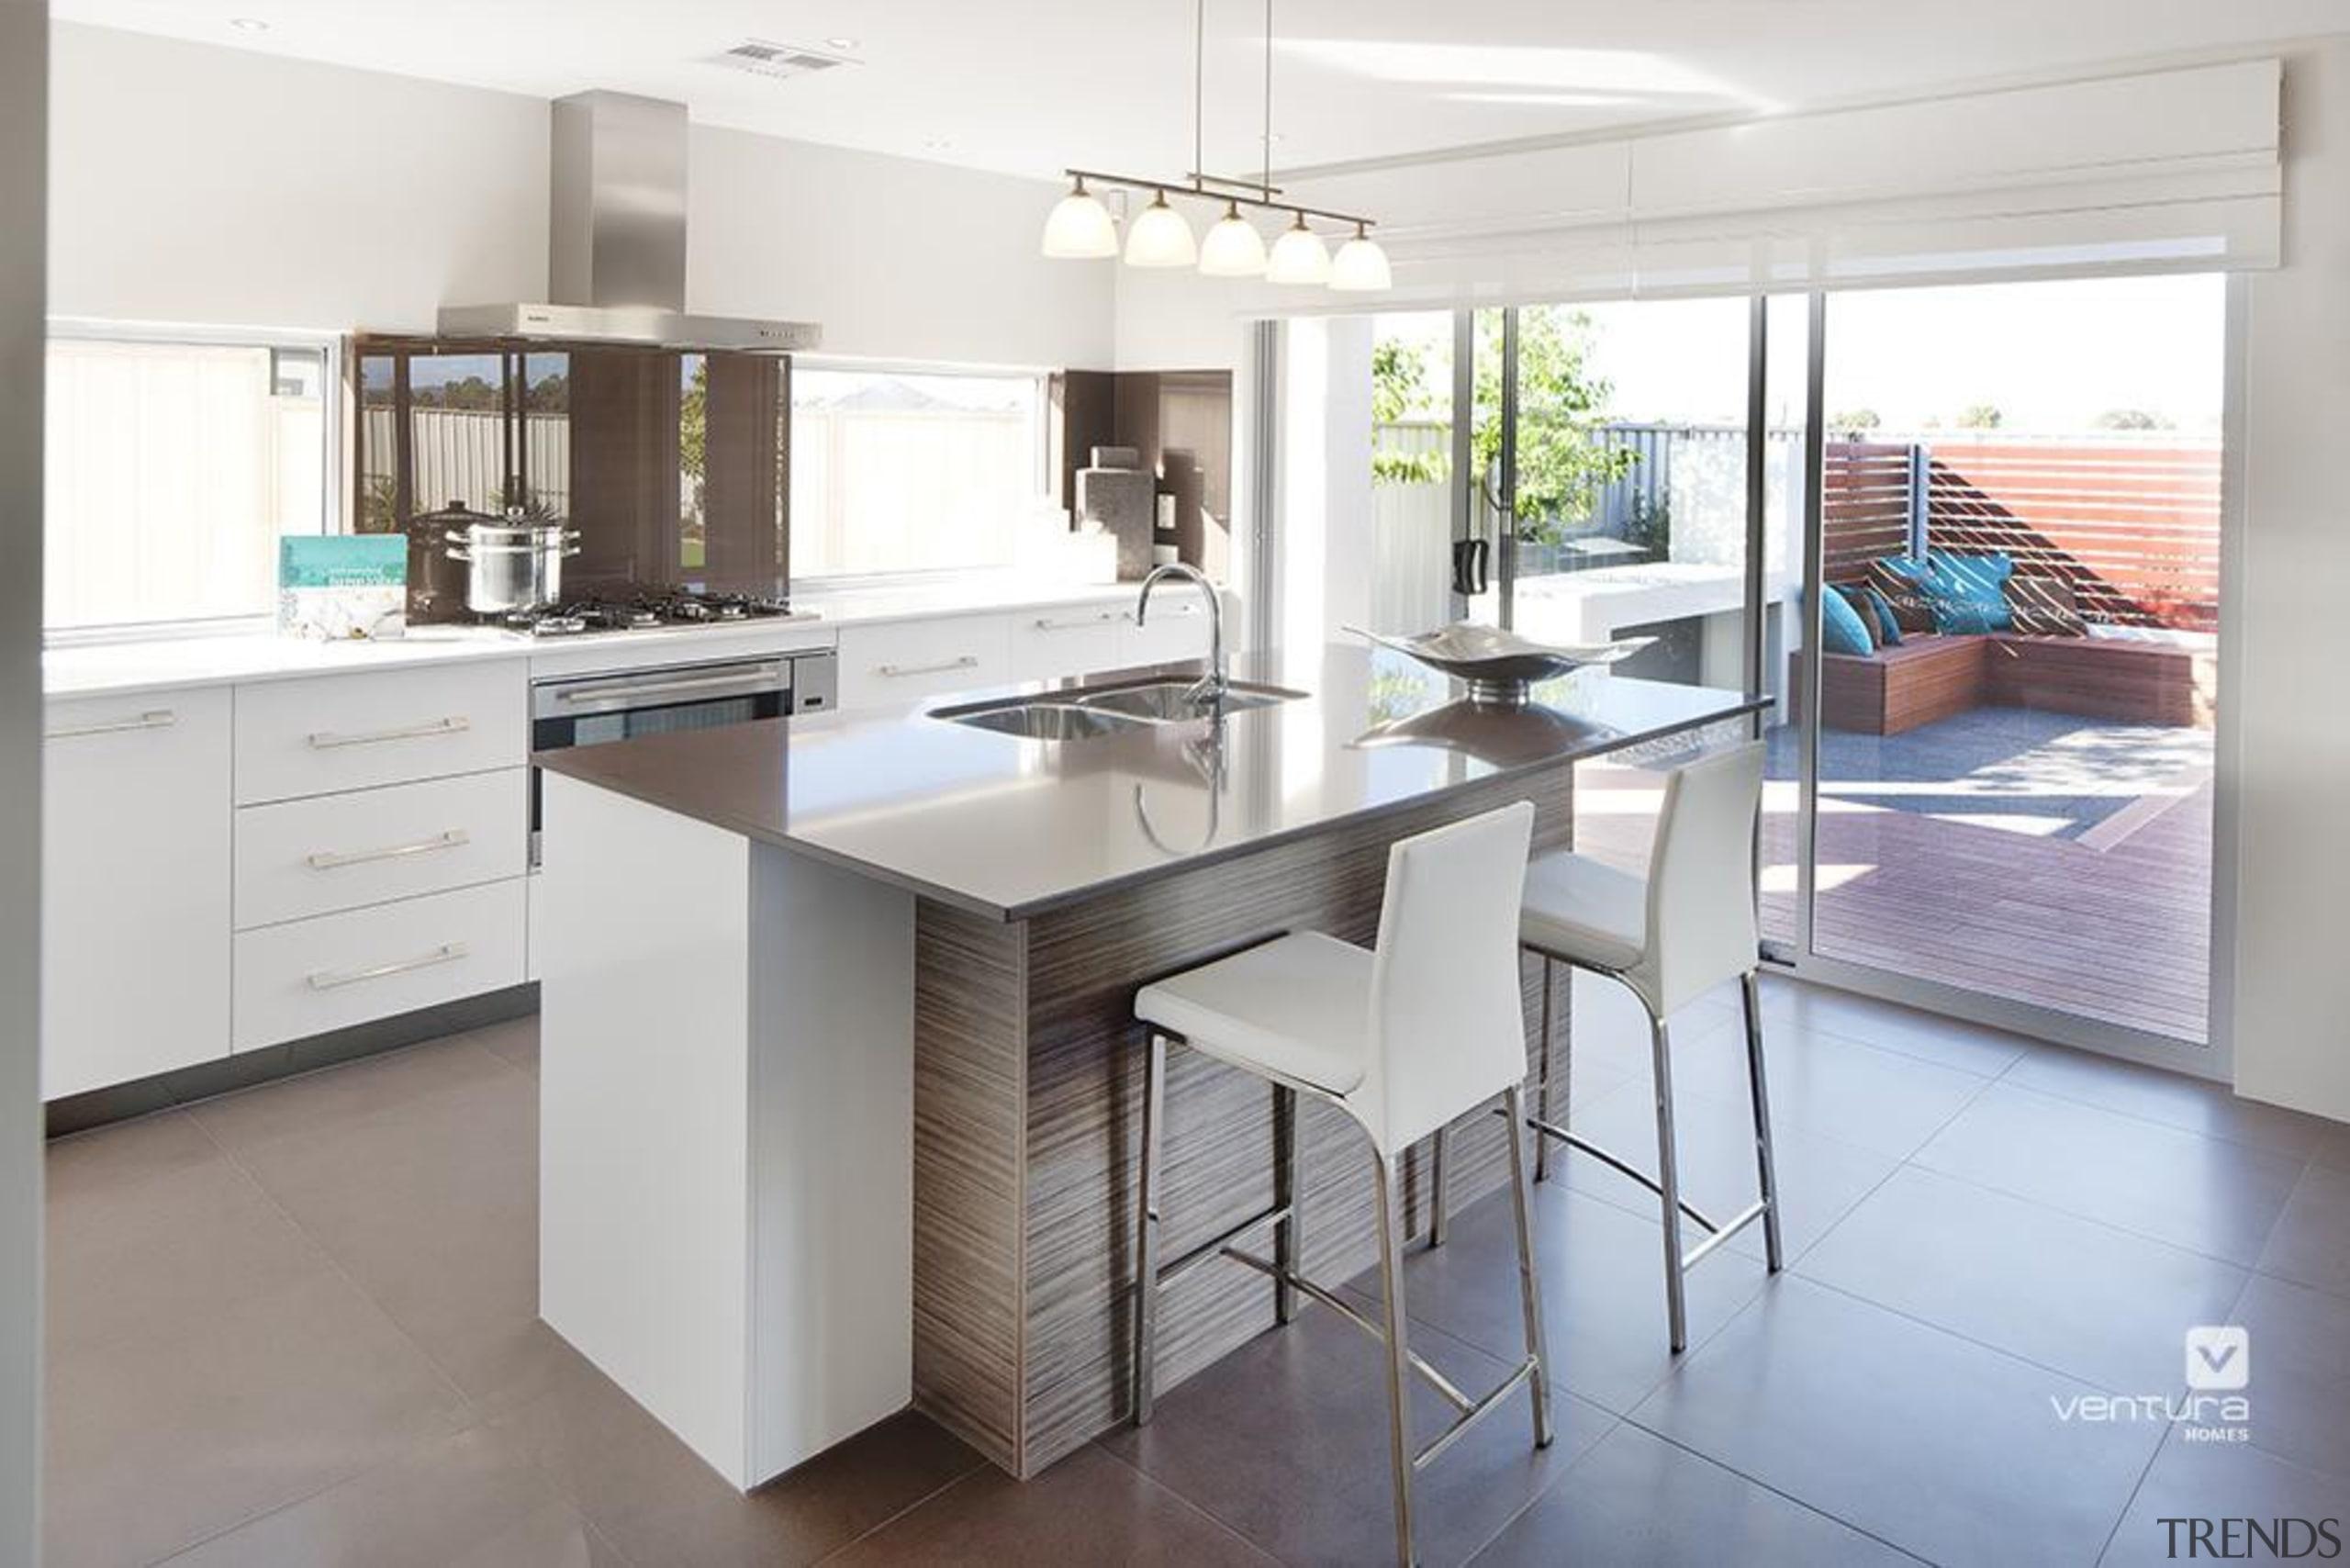 Kitchen design. - The Monticello Display Home - cabinetry, countertop, cuisine classique, floor, flooring, interior design, kitchen, real estate, room, white, gray